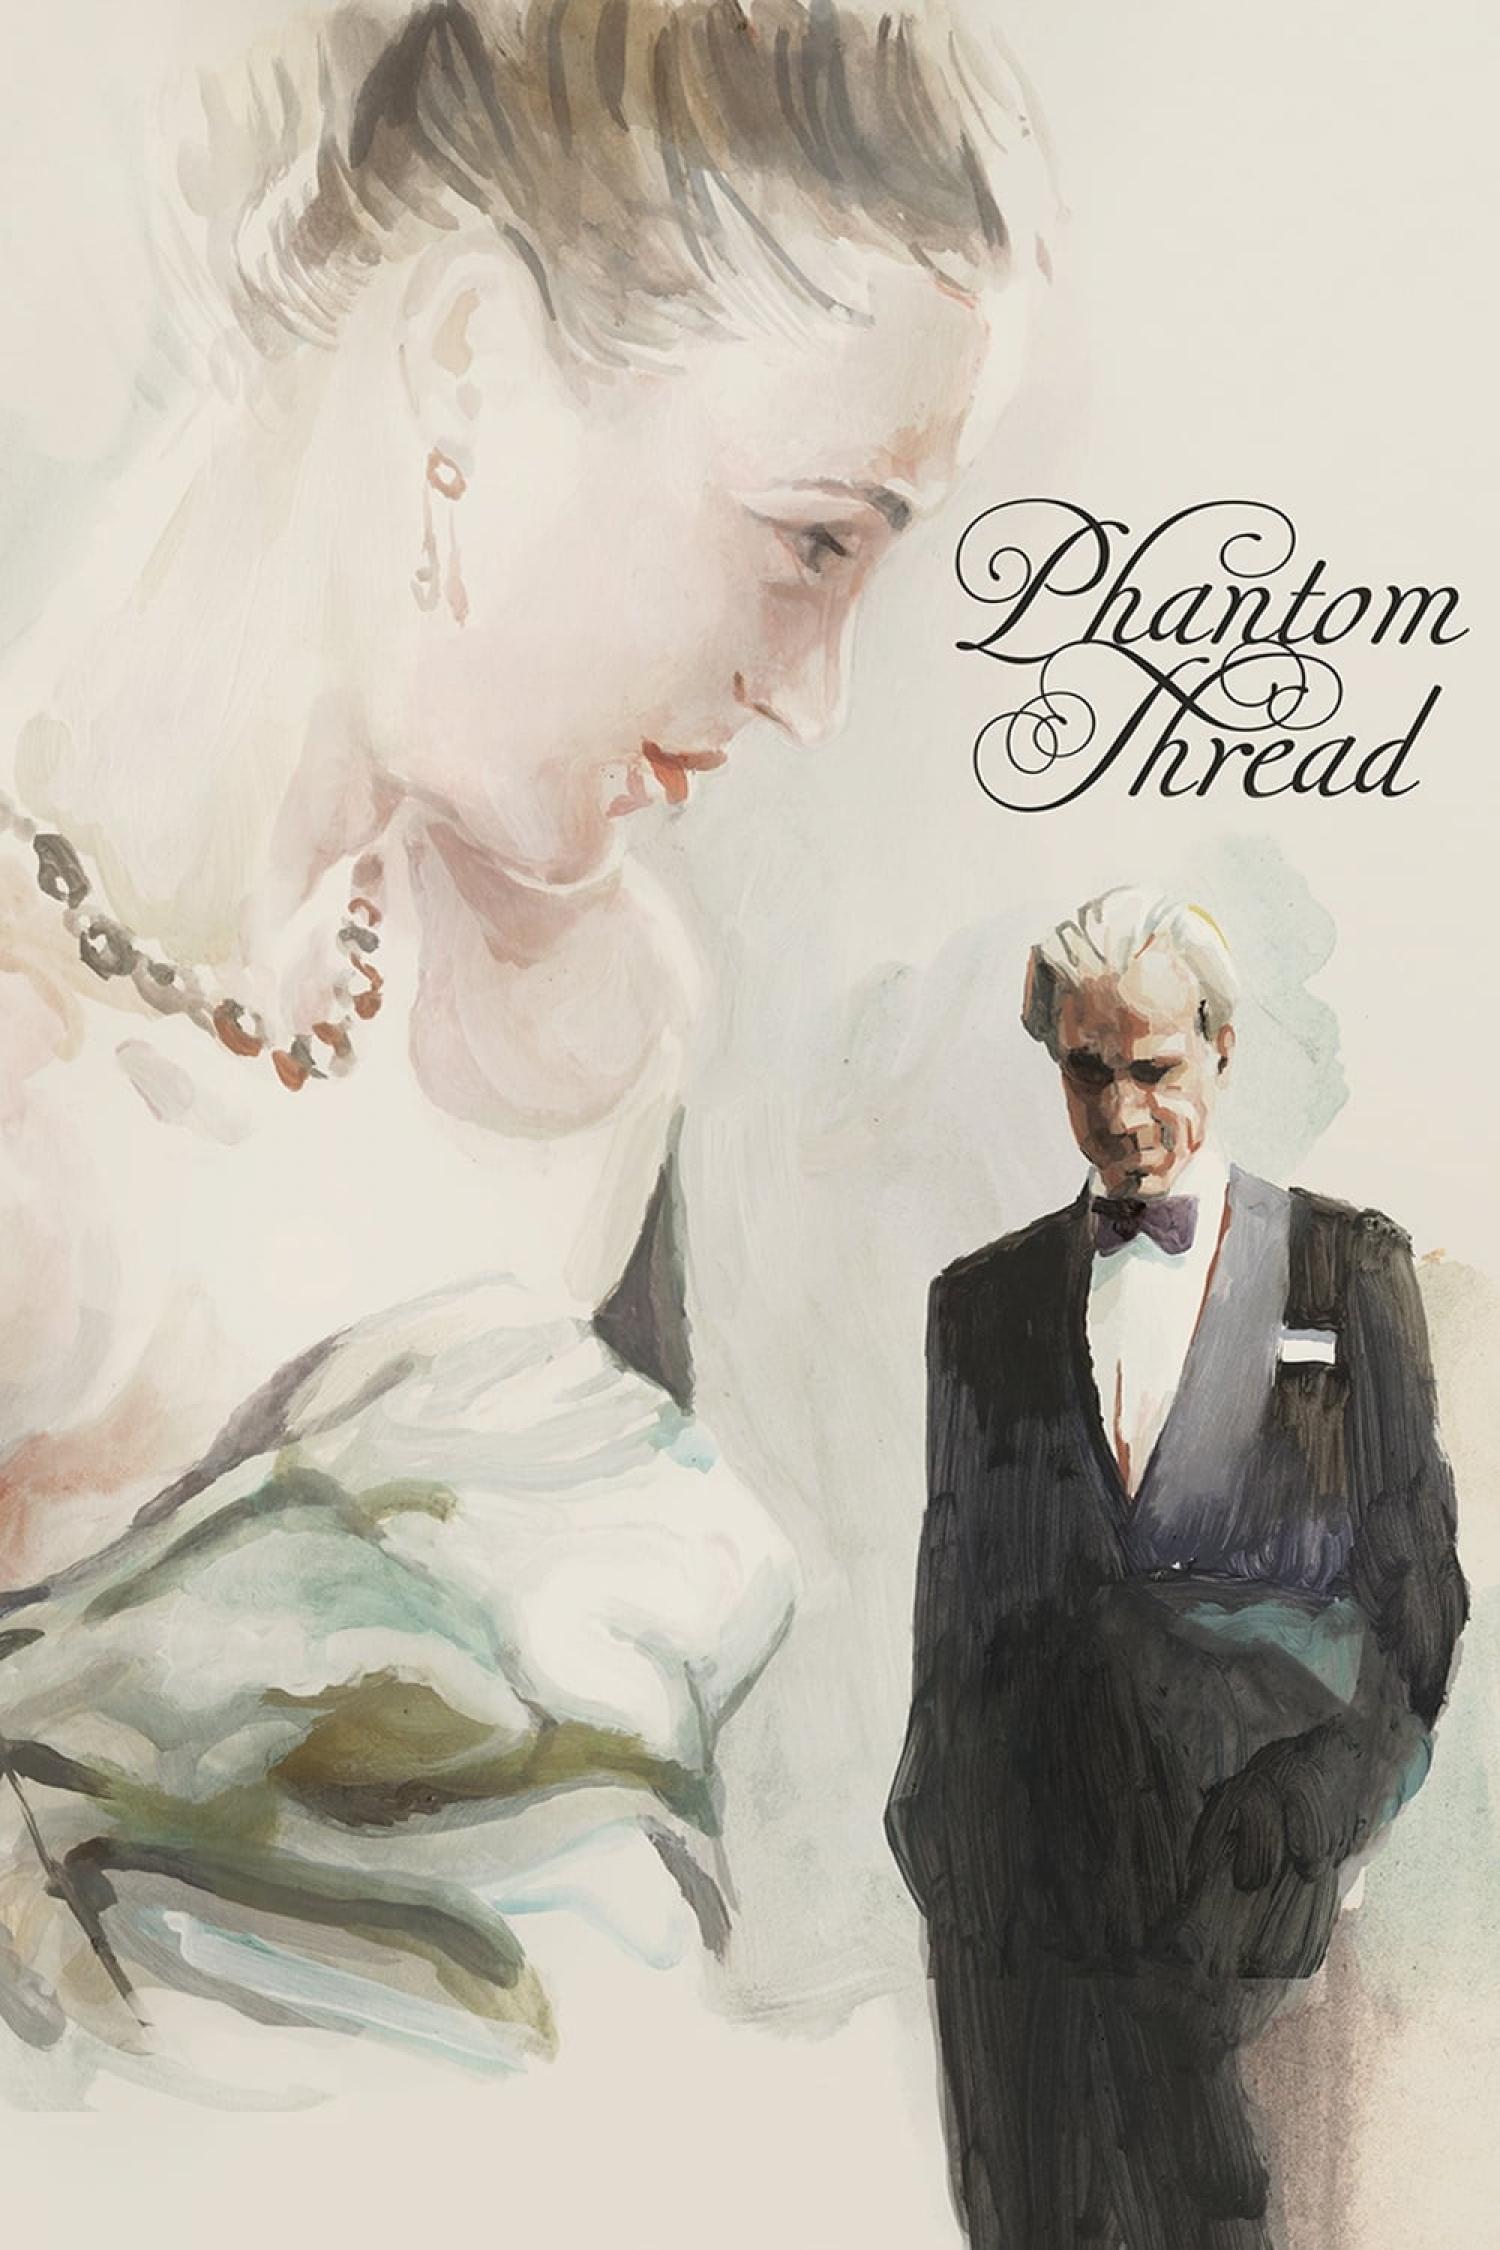 Phantom Thread Arvostelu